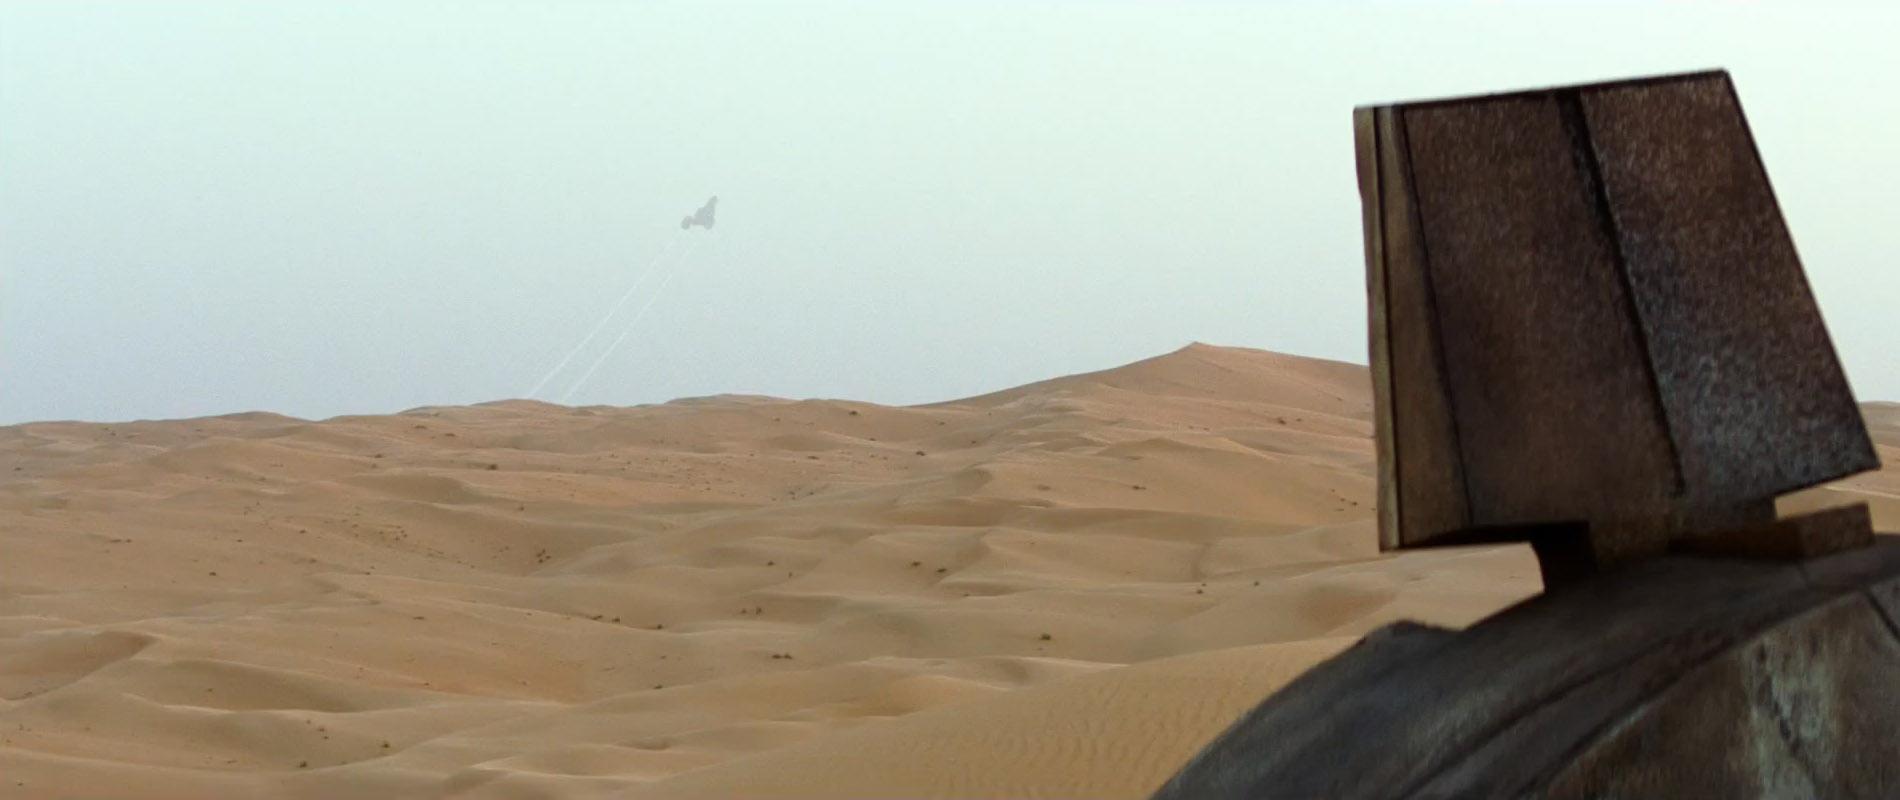 Star-Wars-7-Trailer-3-Rey-Views-Ship-in-